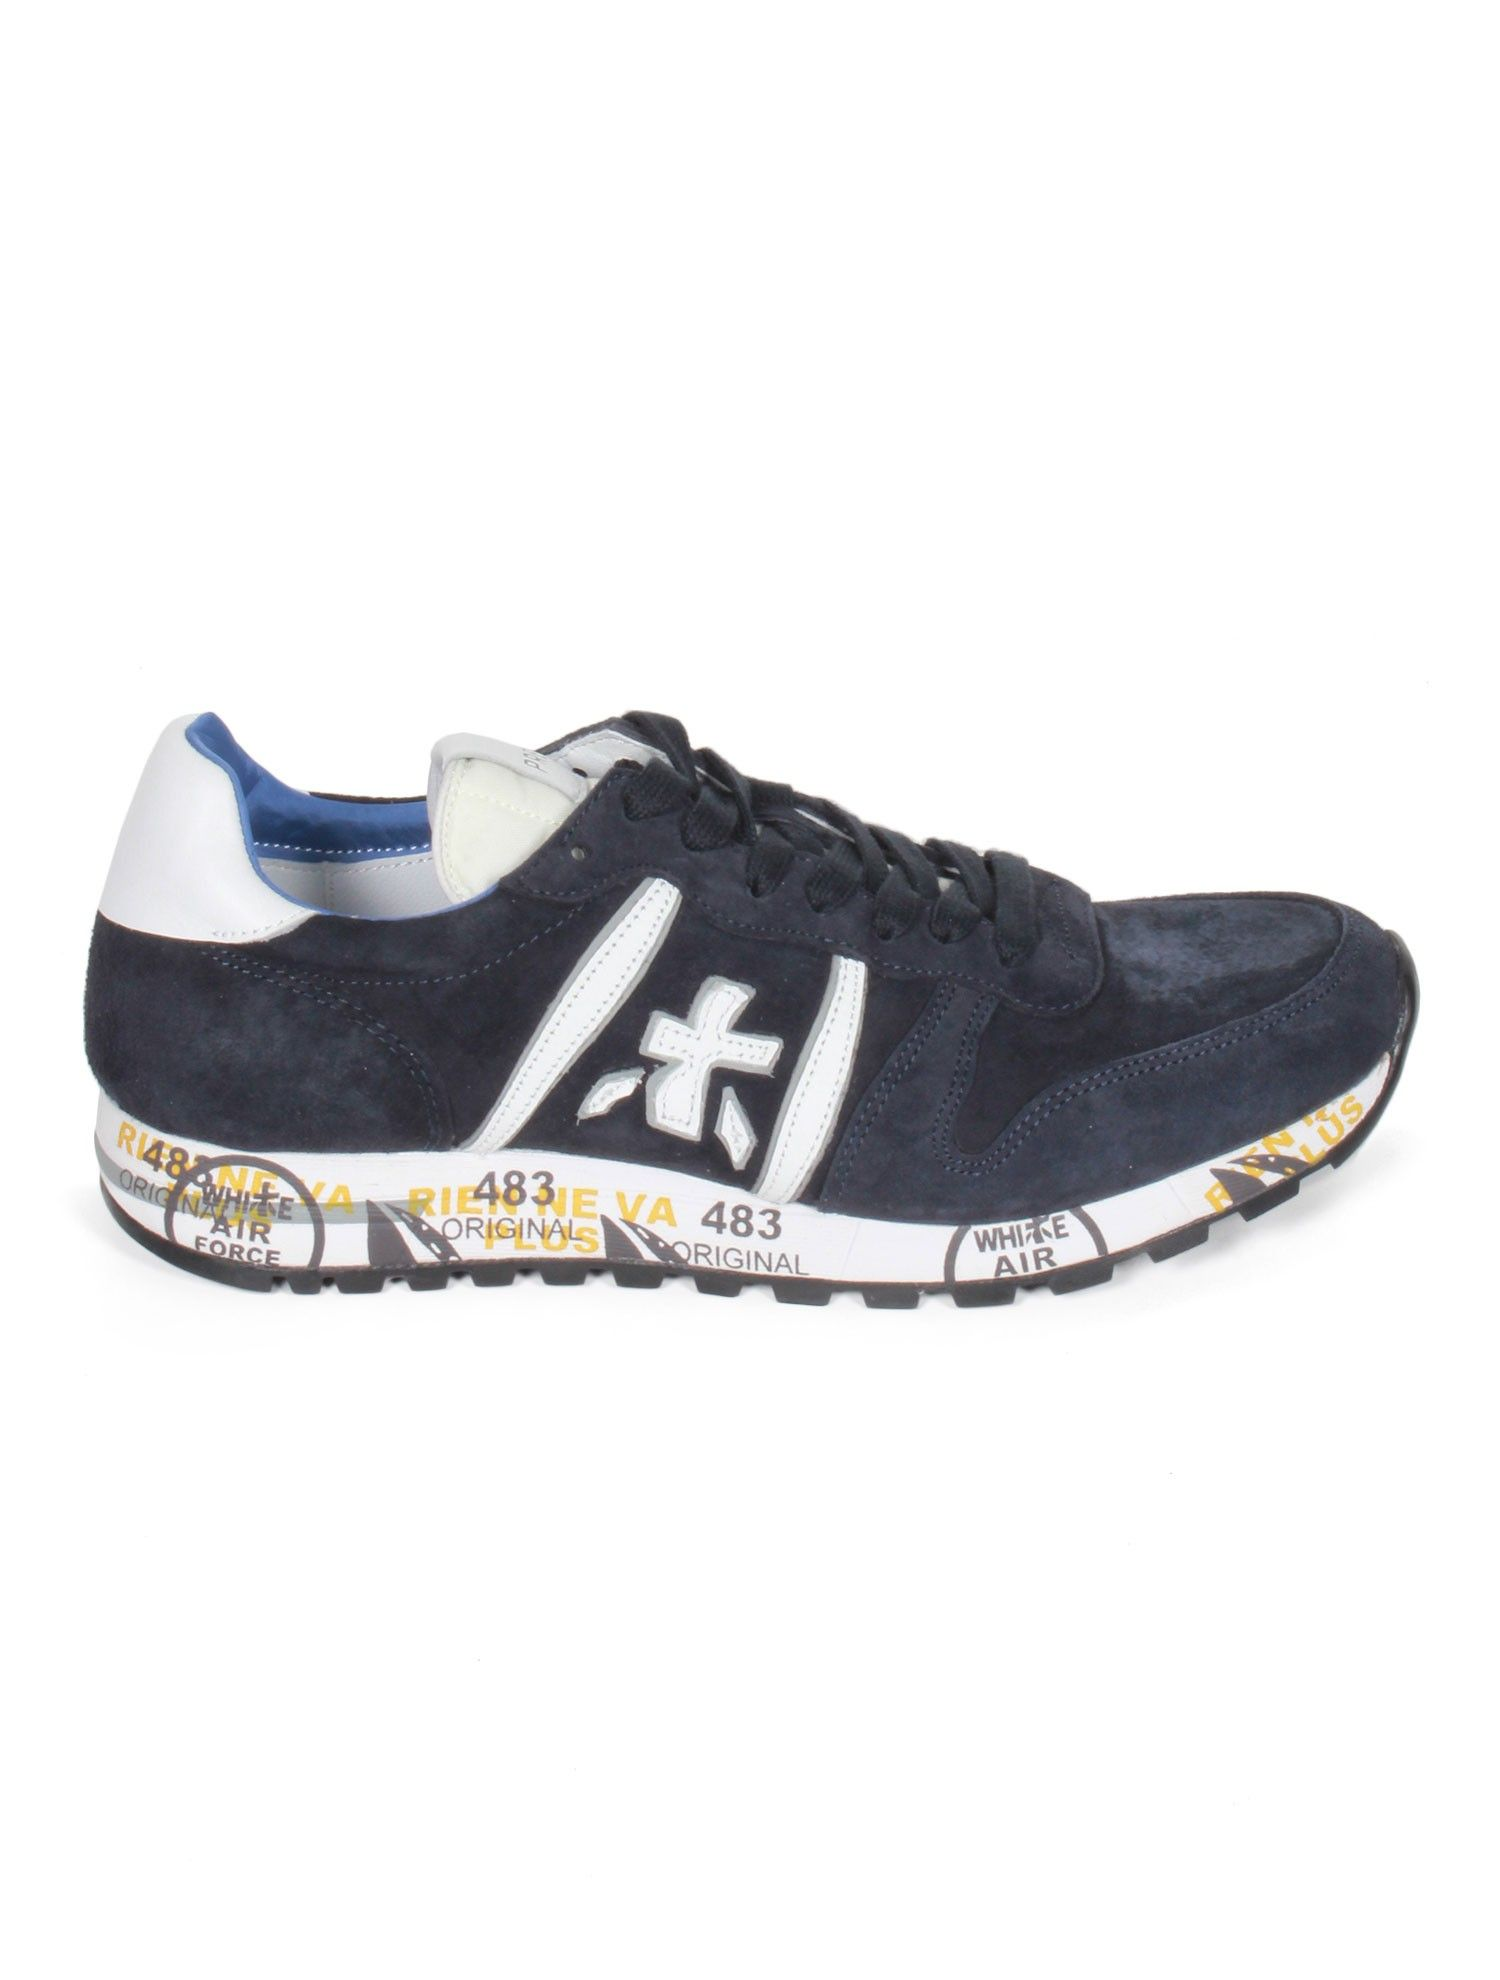 PREMIATA White Eric Men's Nubuck Sneakers - Navy - serie     NOIRE